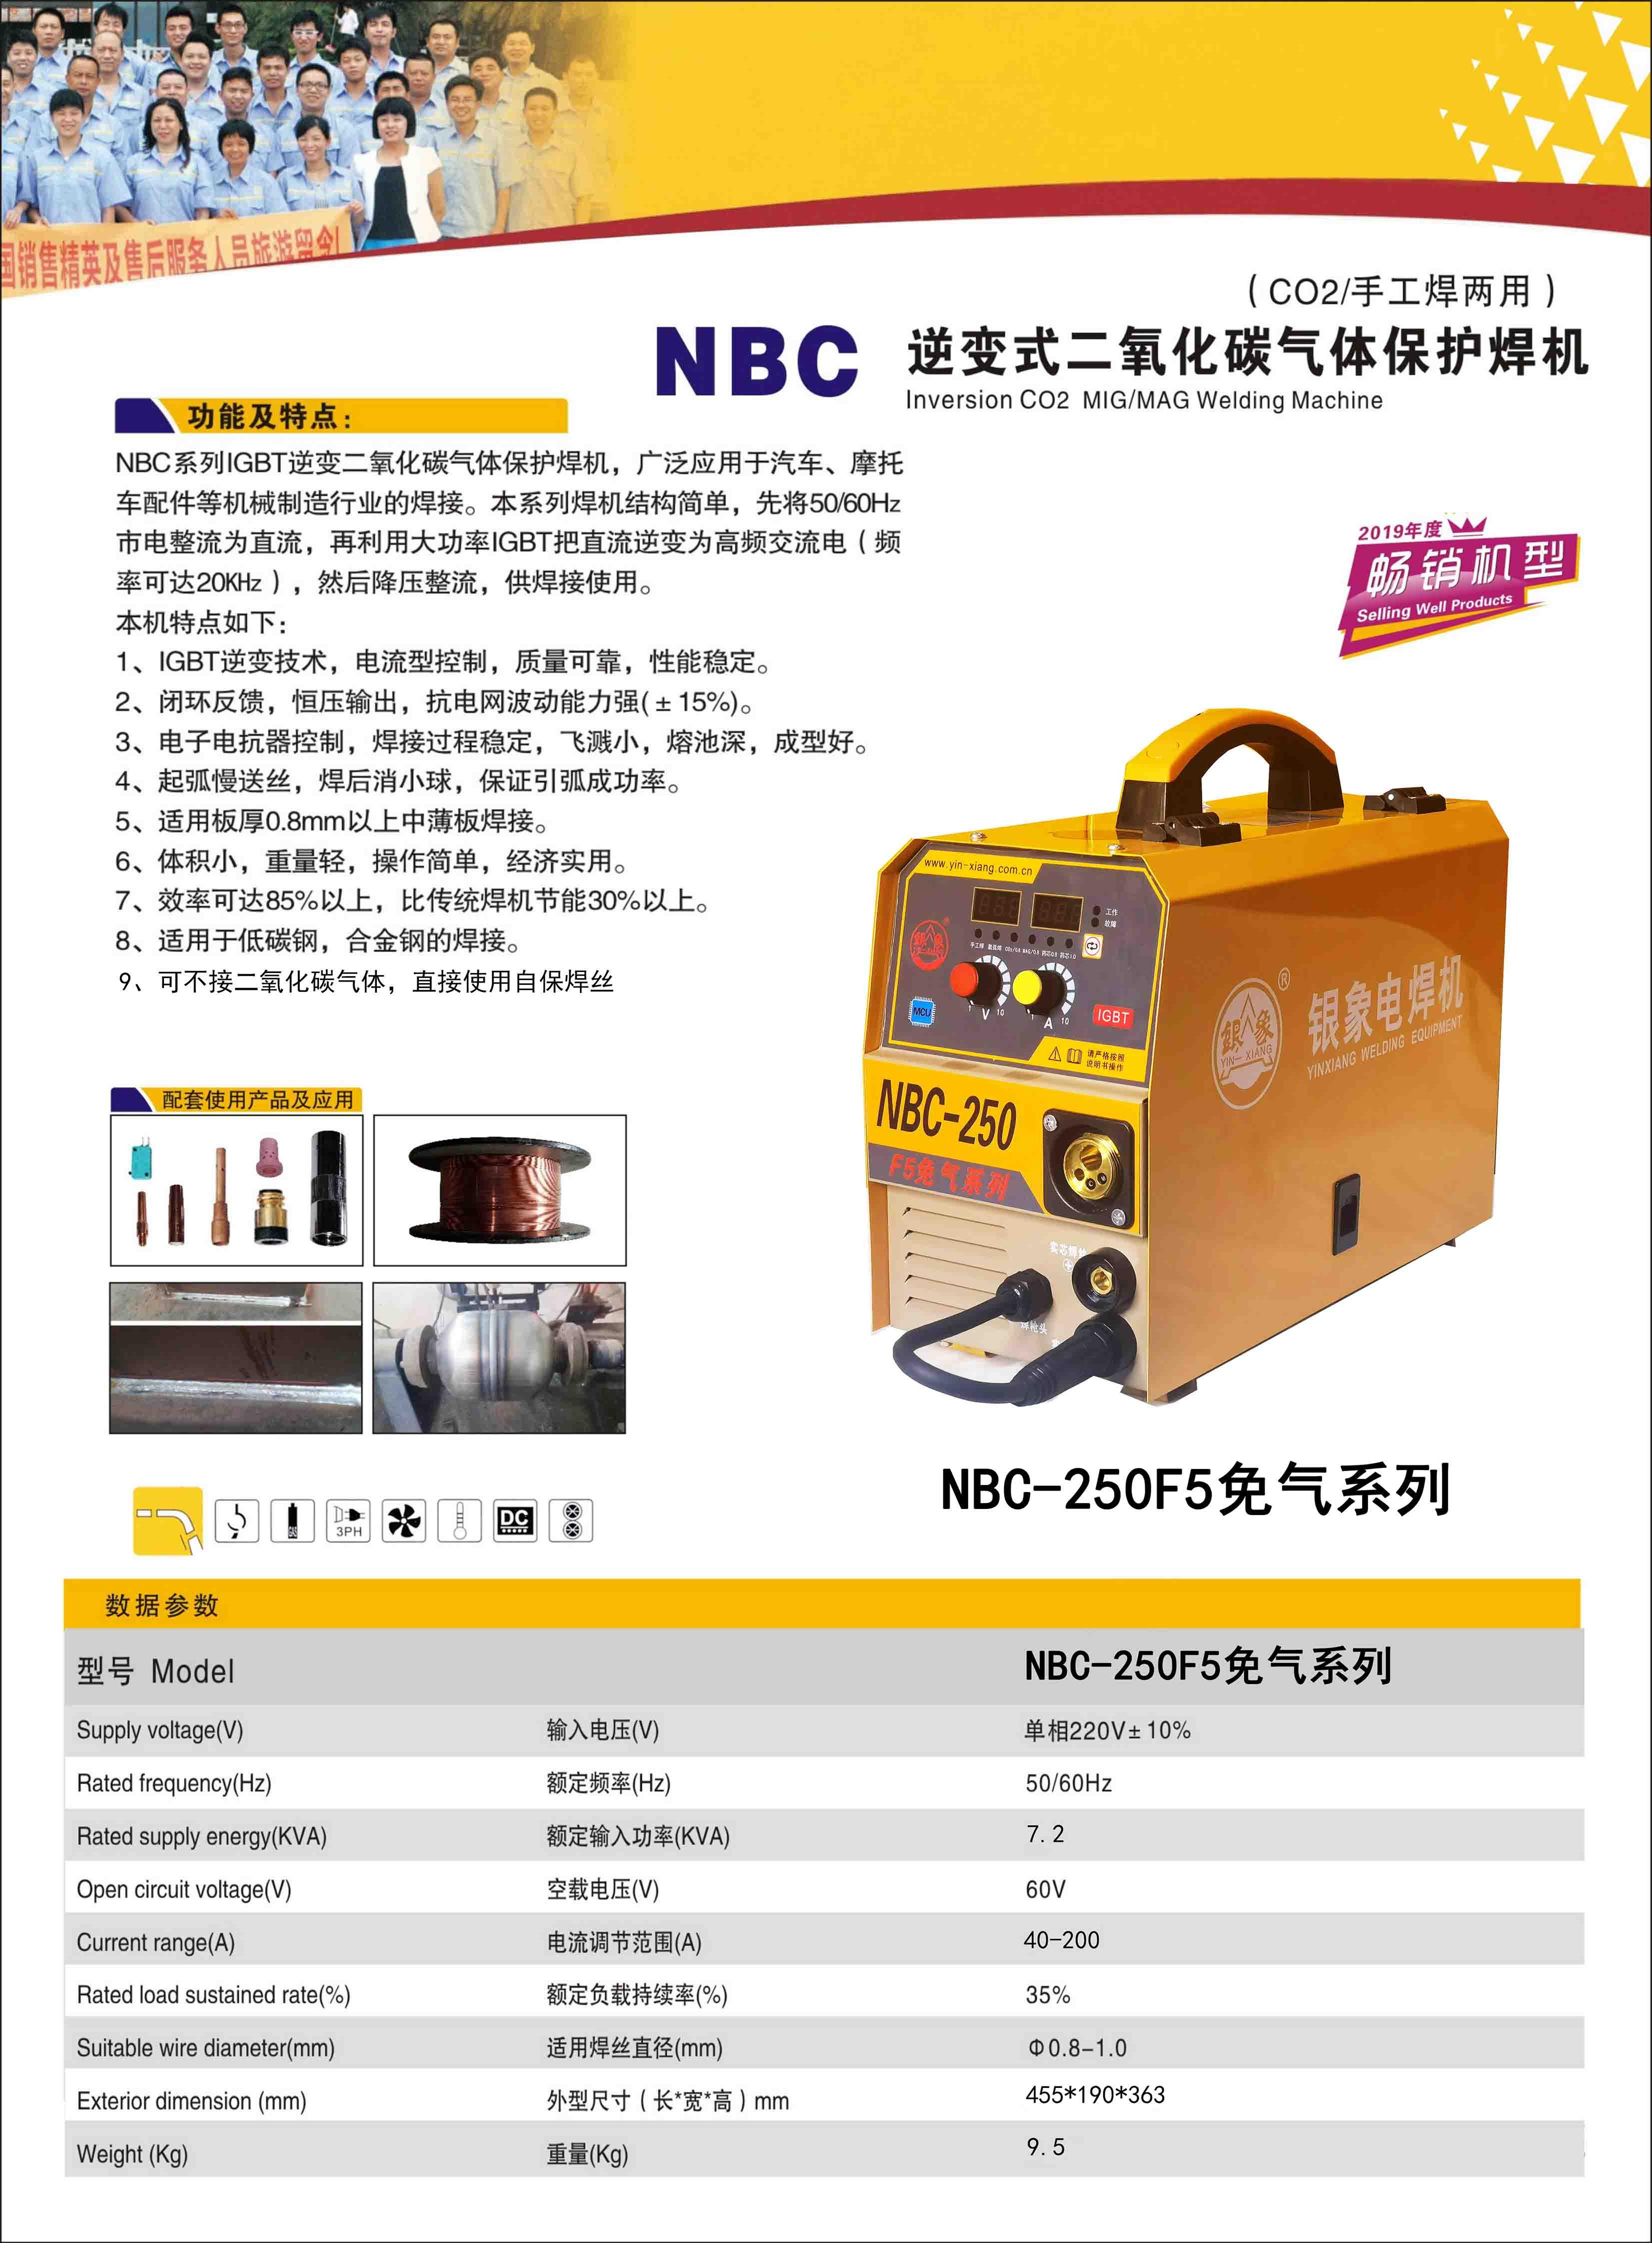 NBC-250F5 - 副本.jpg